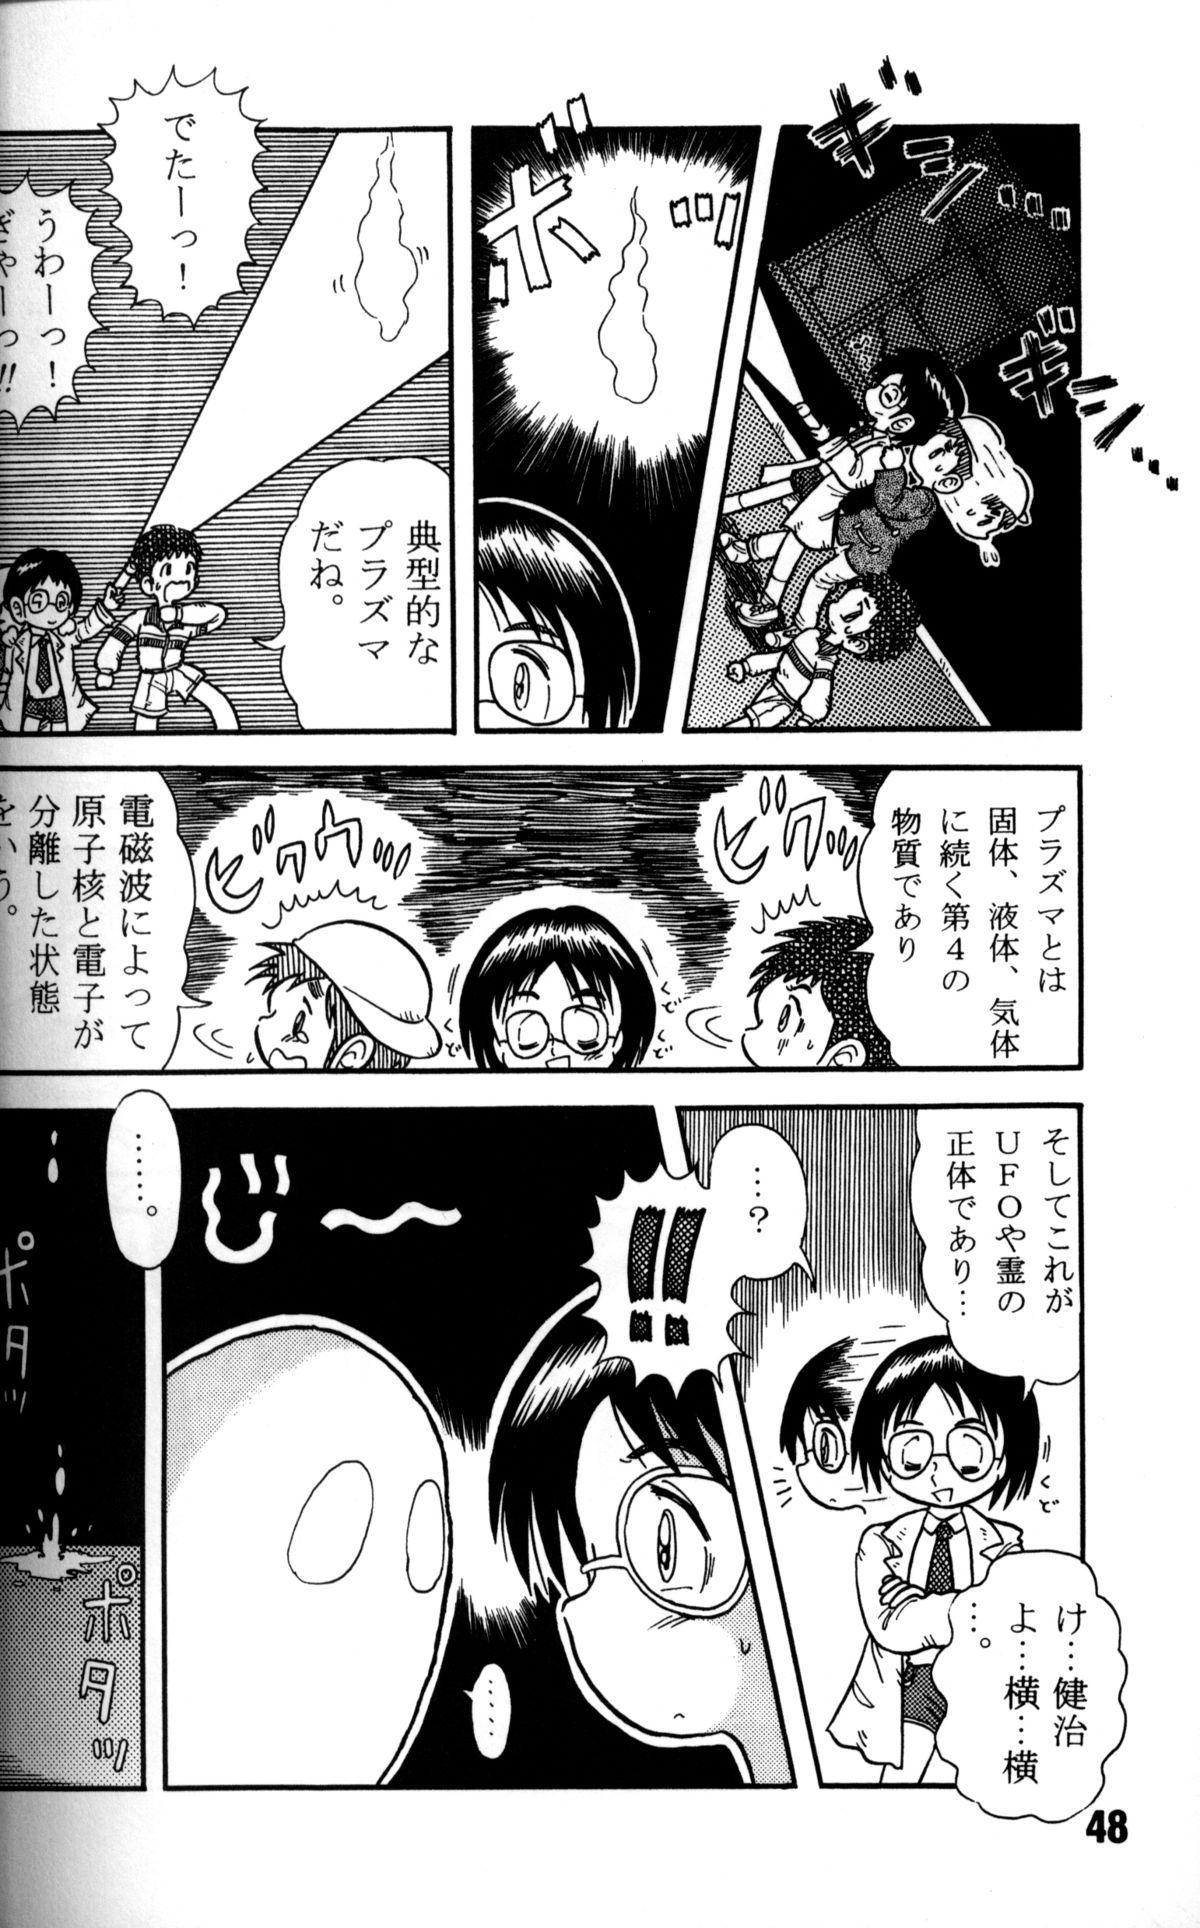 Anthology - Nekketsu Project - Volume 4 'Shounen Vanilla Essence' 46